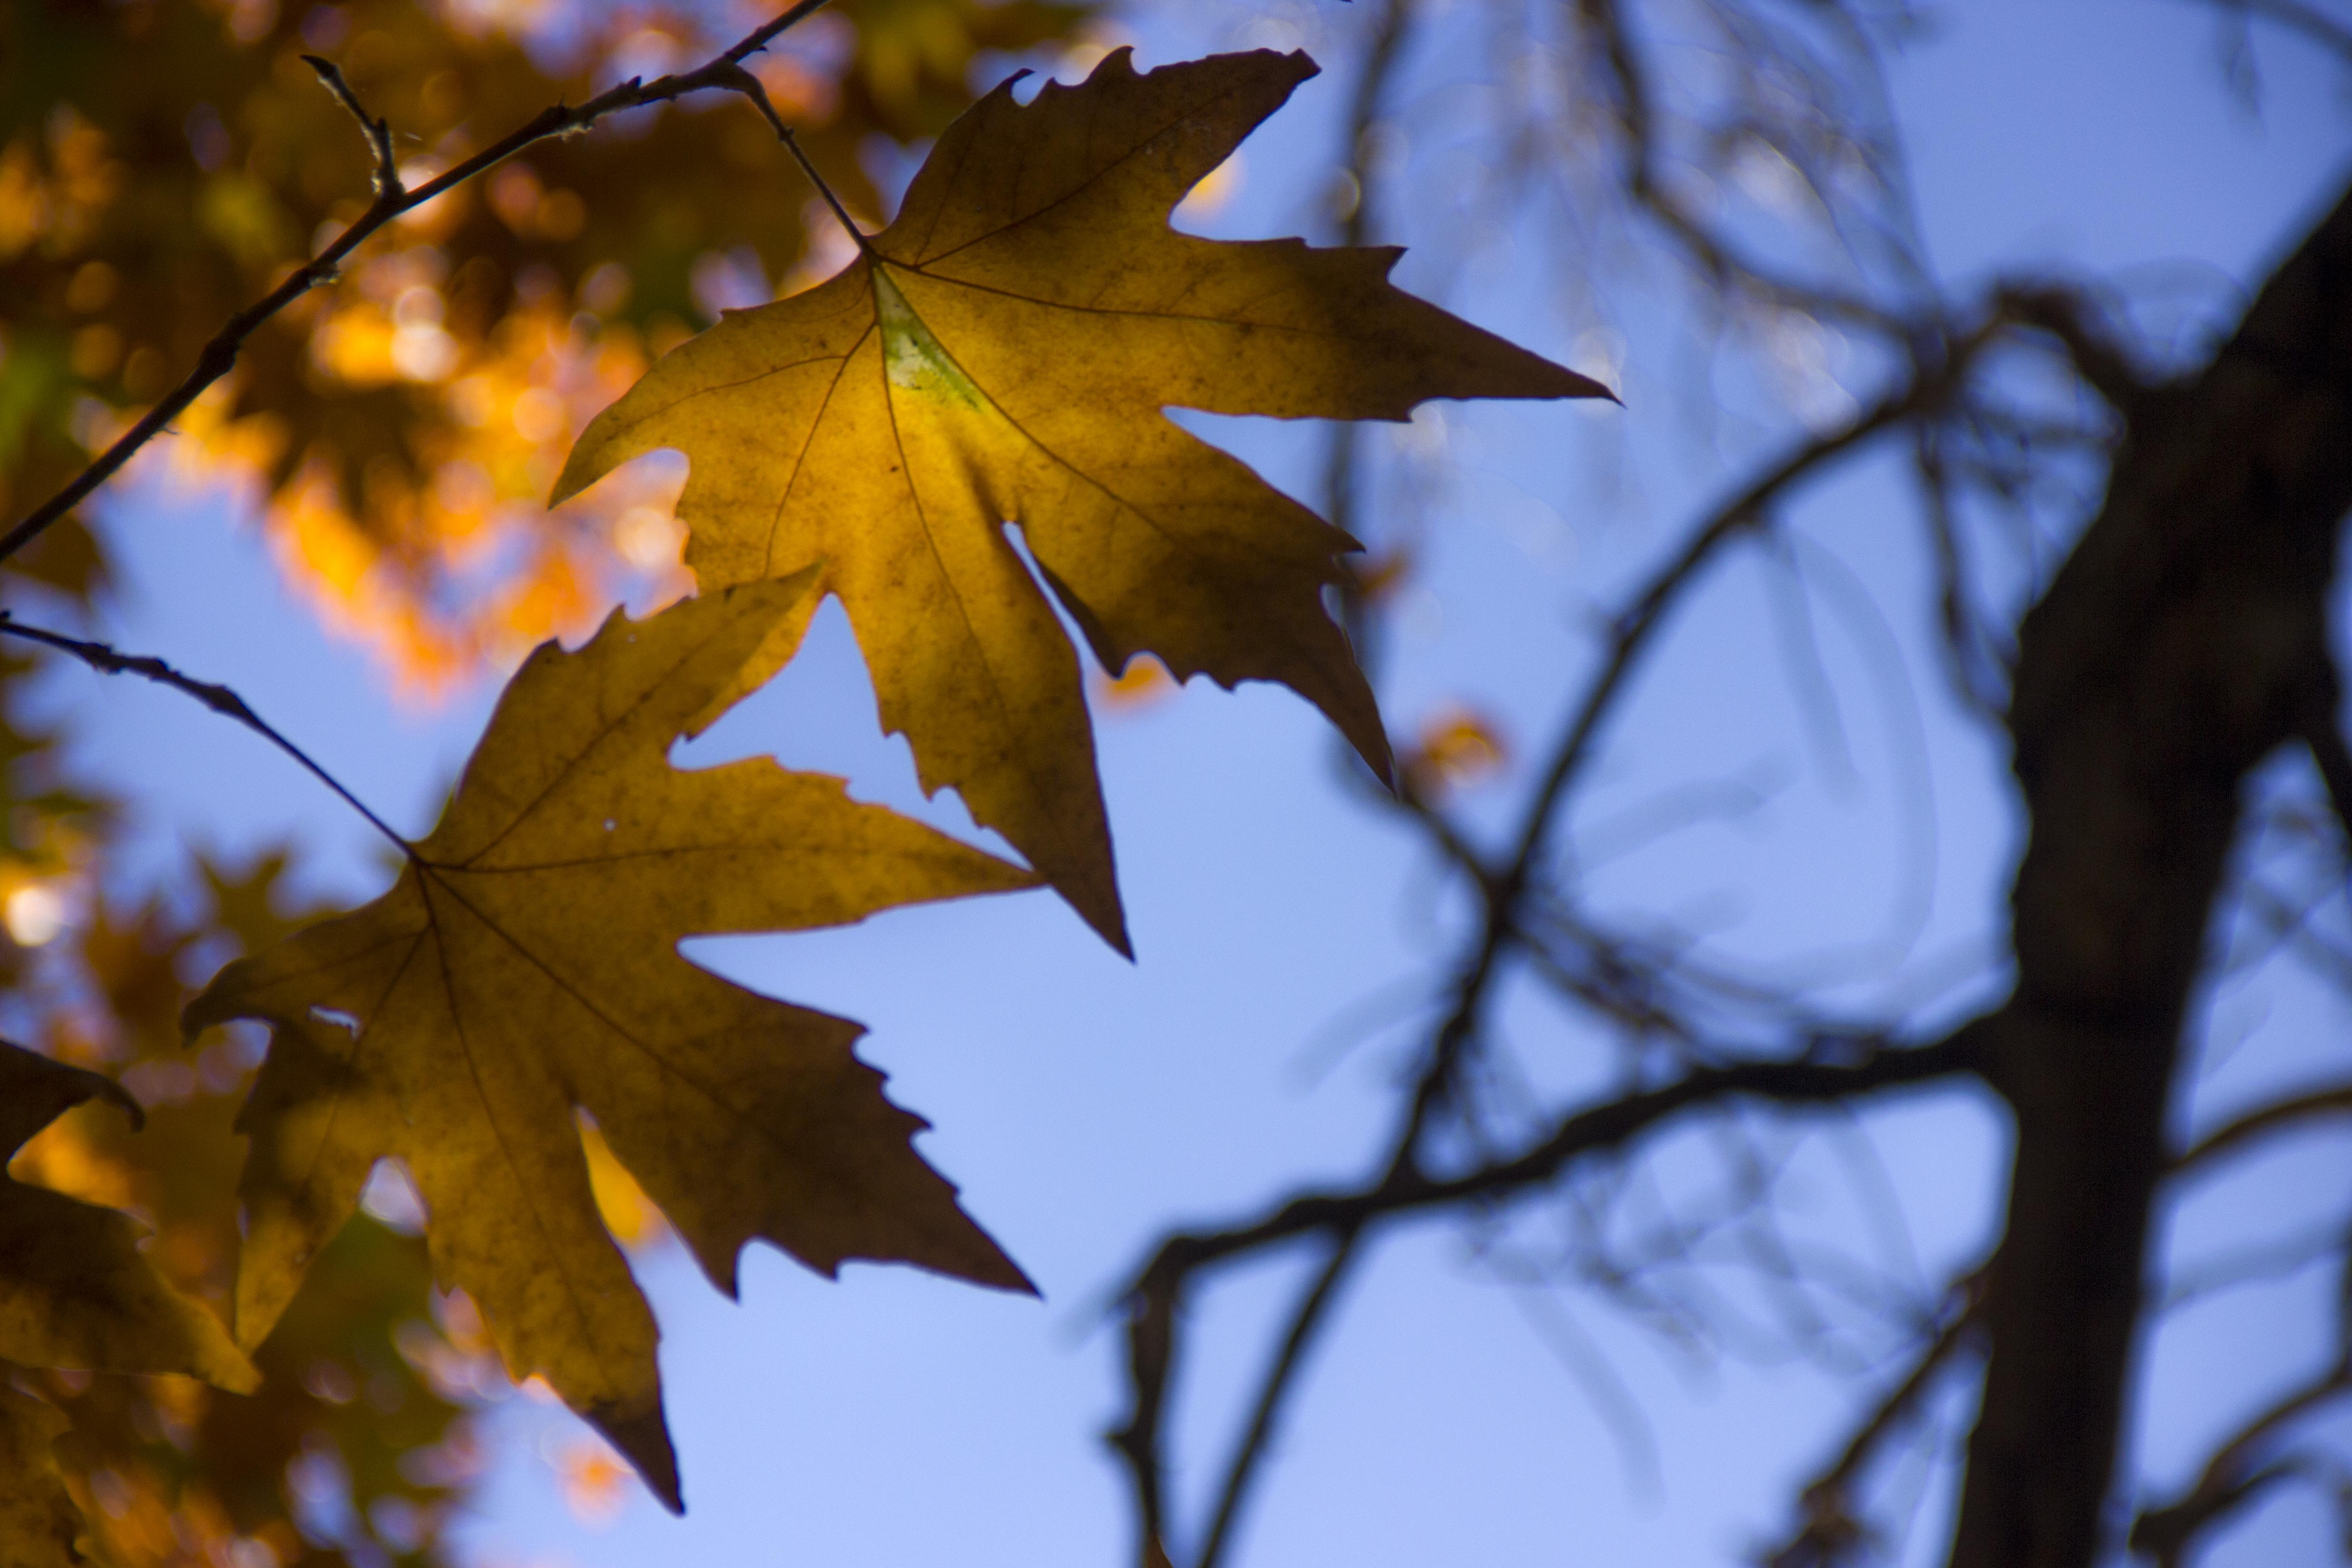 برگ زرد-پاییز-yellow leaves-falling leaves 07.jpg